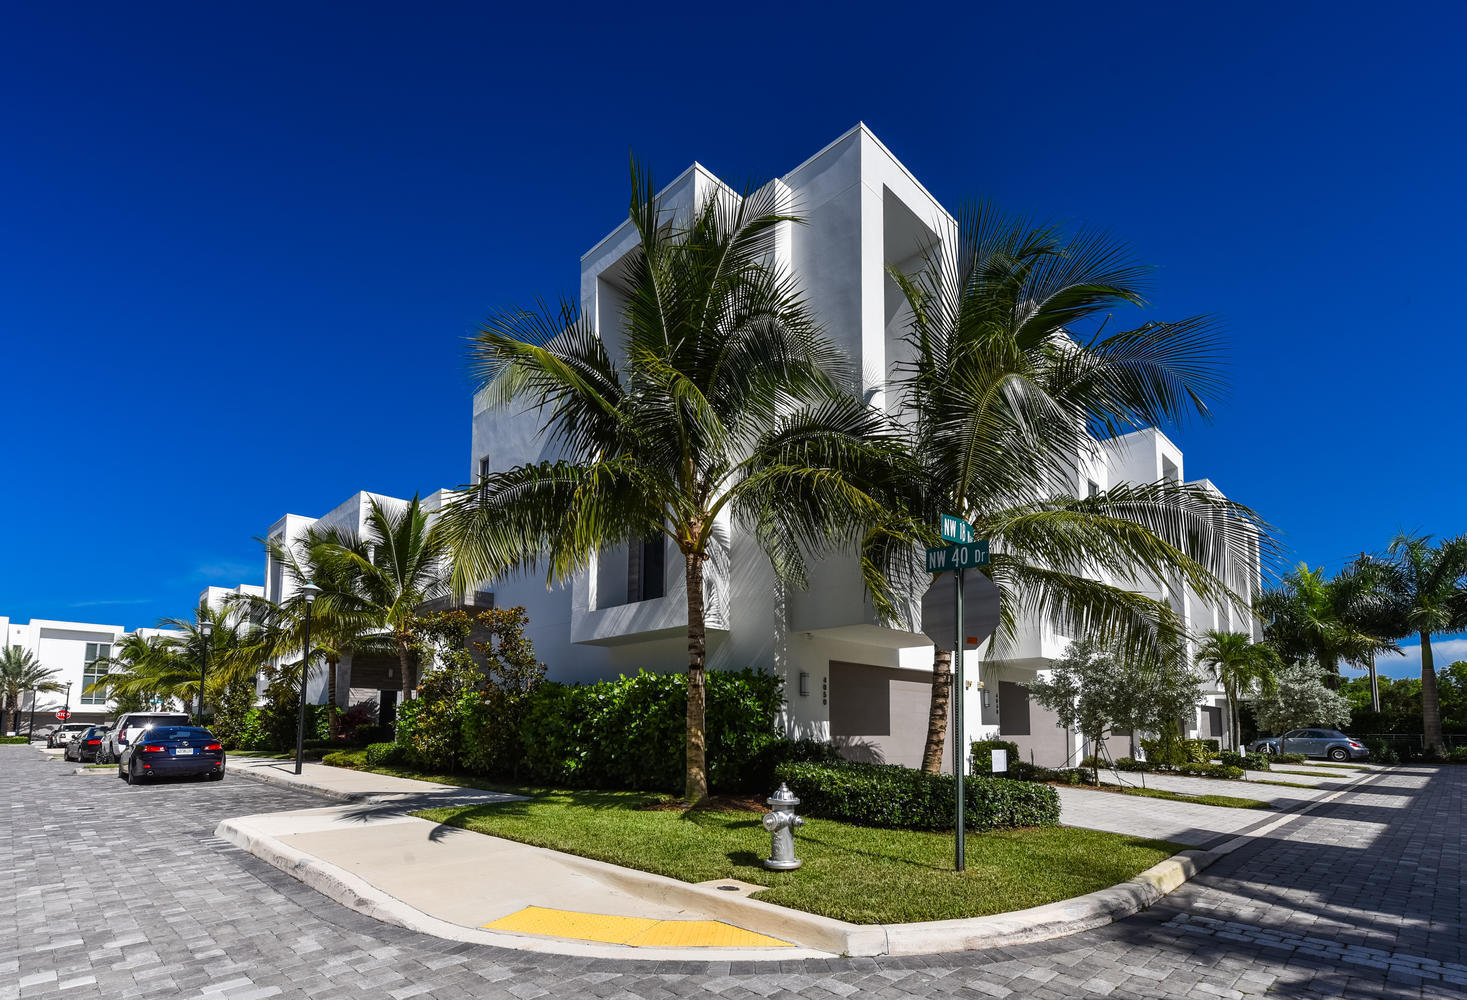 4050 NW 18th Way  Boca Raton FL 33431